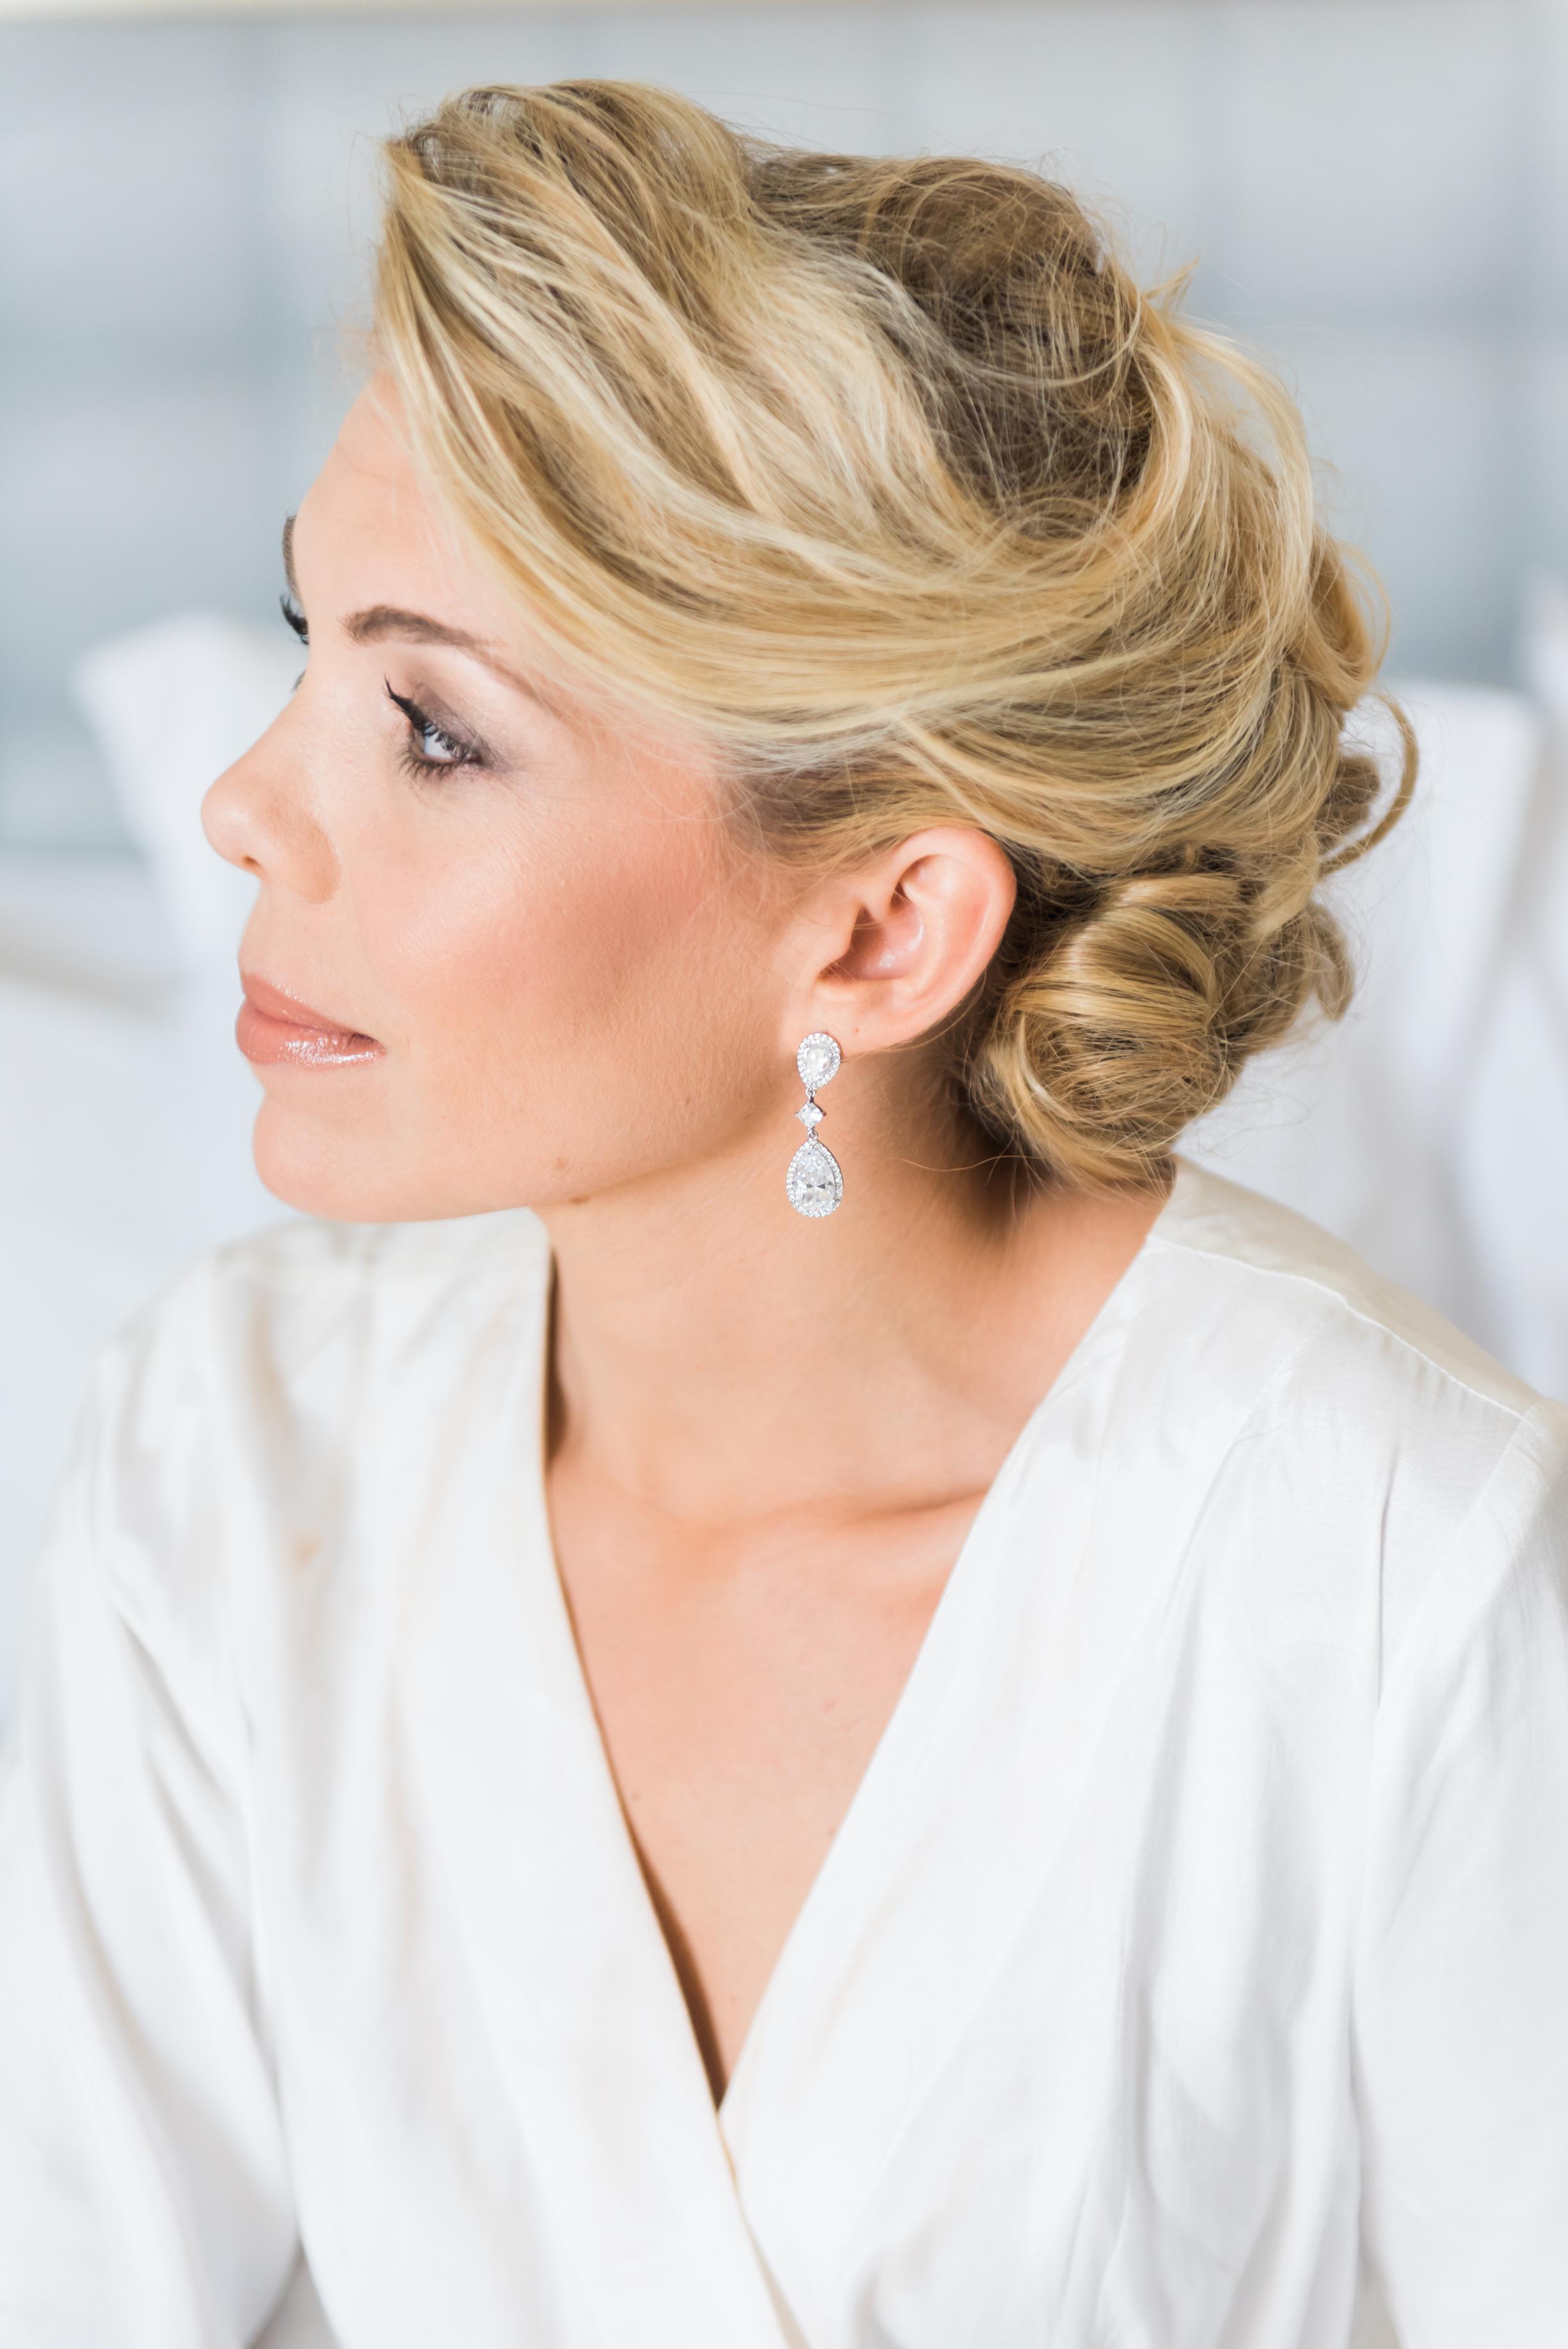 Gorgeous Bridal Up Do Hairstyles - Flagler Museum Palm Beach Wedding Venue - The Overwhelmed Bride Wedding Blog